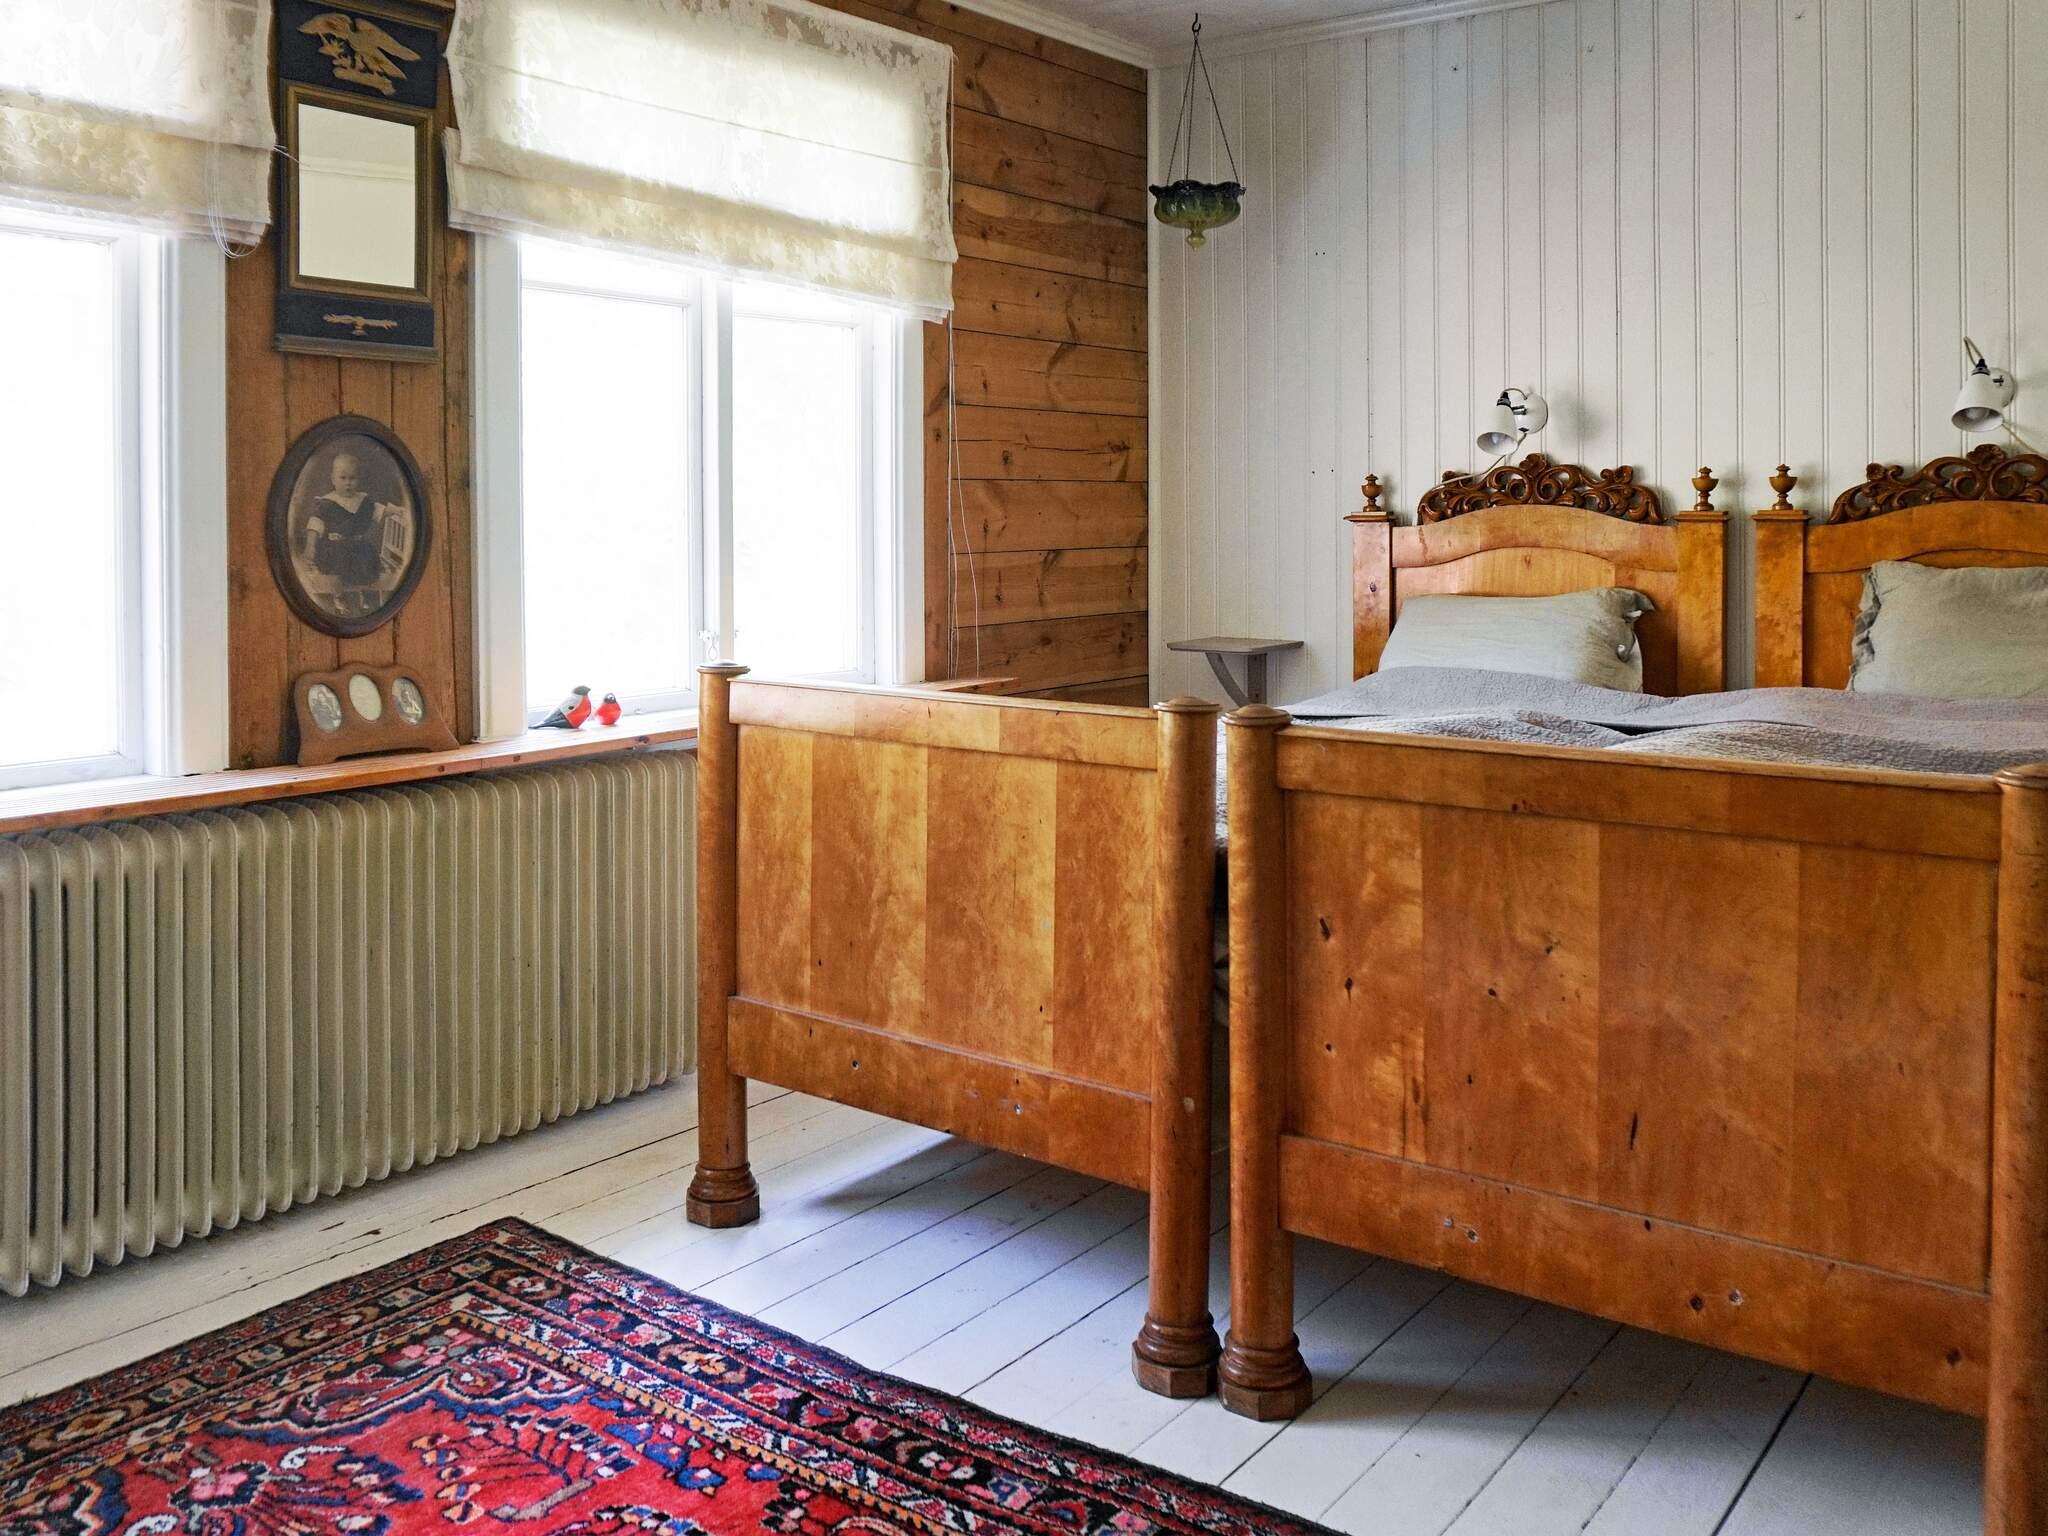 Ferienhaus Orust/Varekil (2621199), Varekil, Västra Götaland län, Westschweden, Schweden, Bild 14